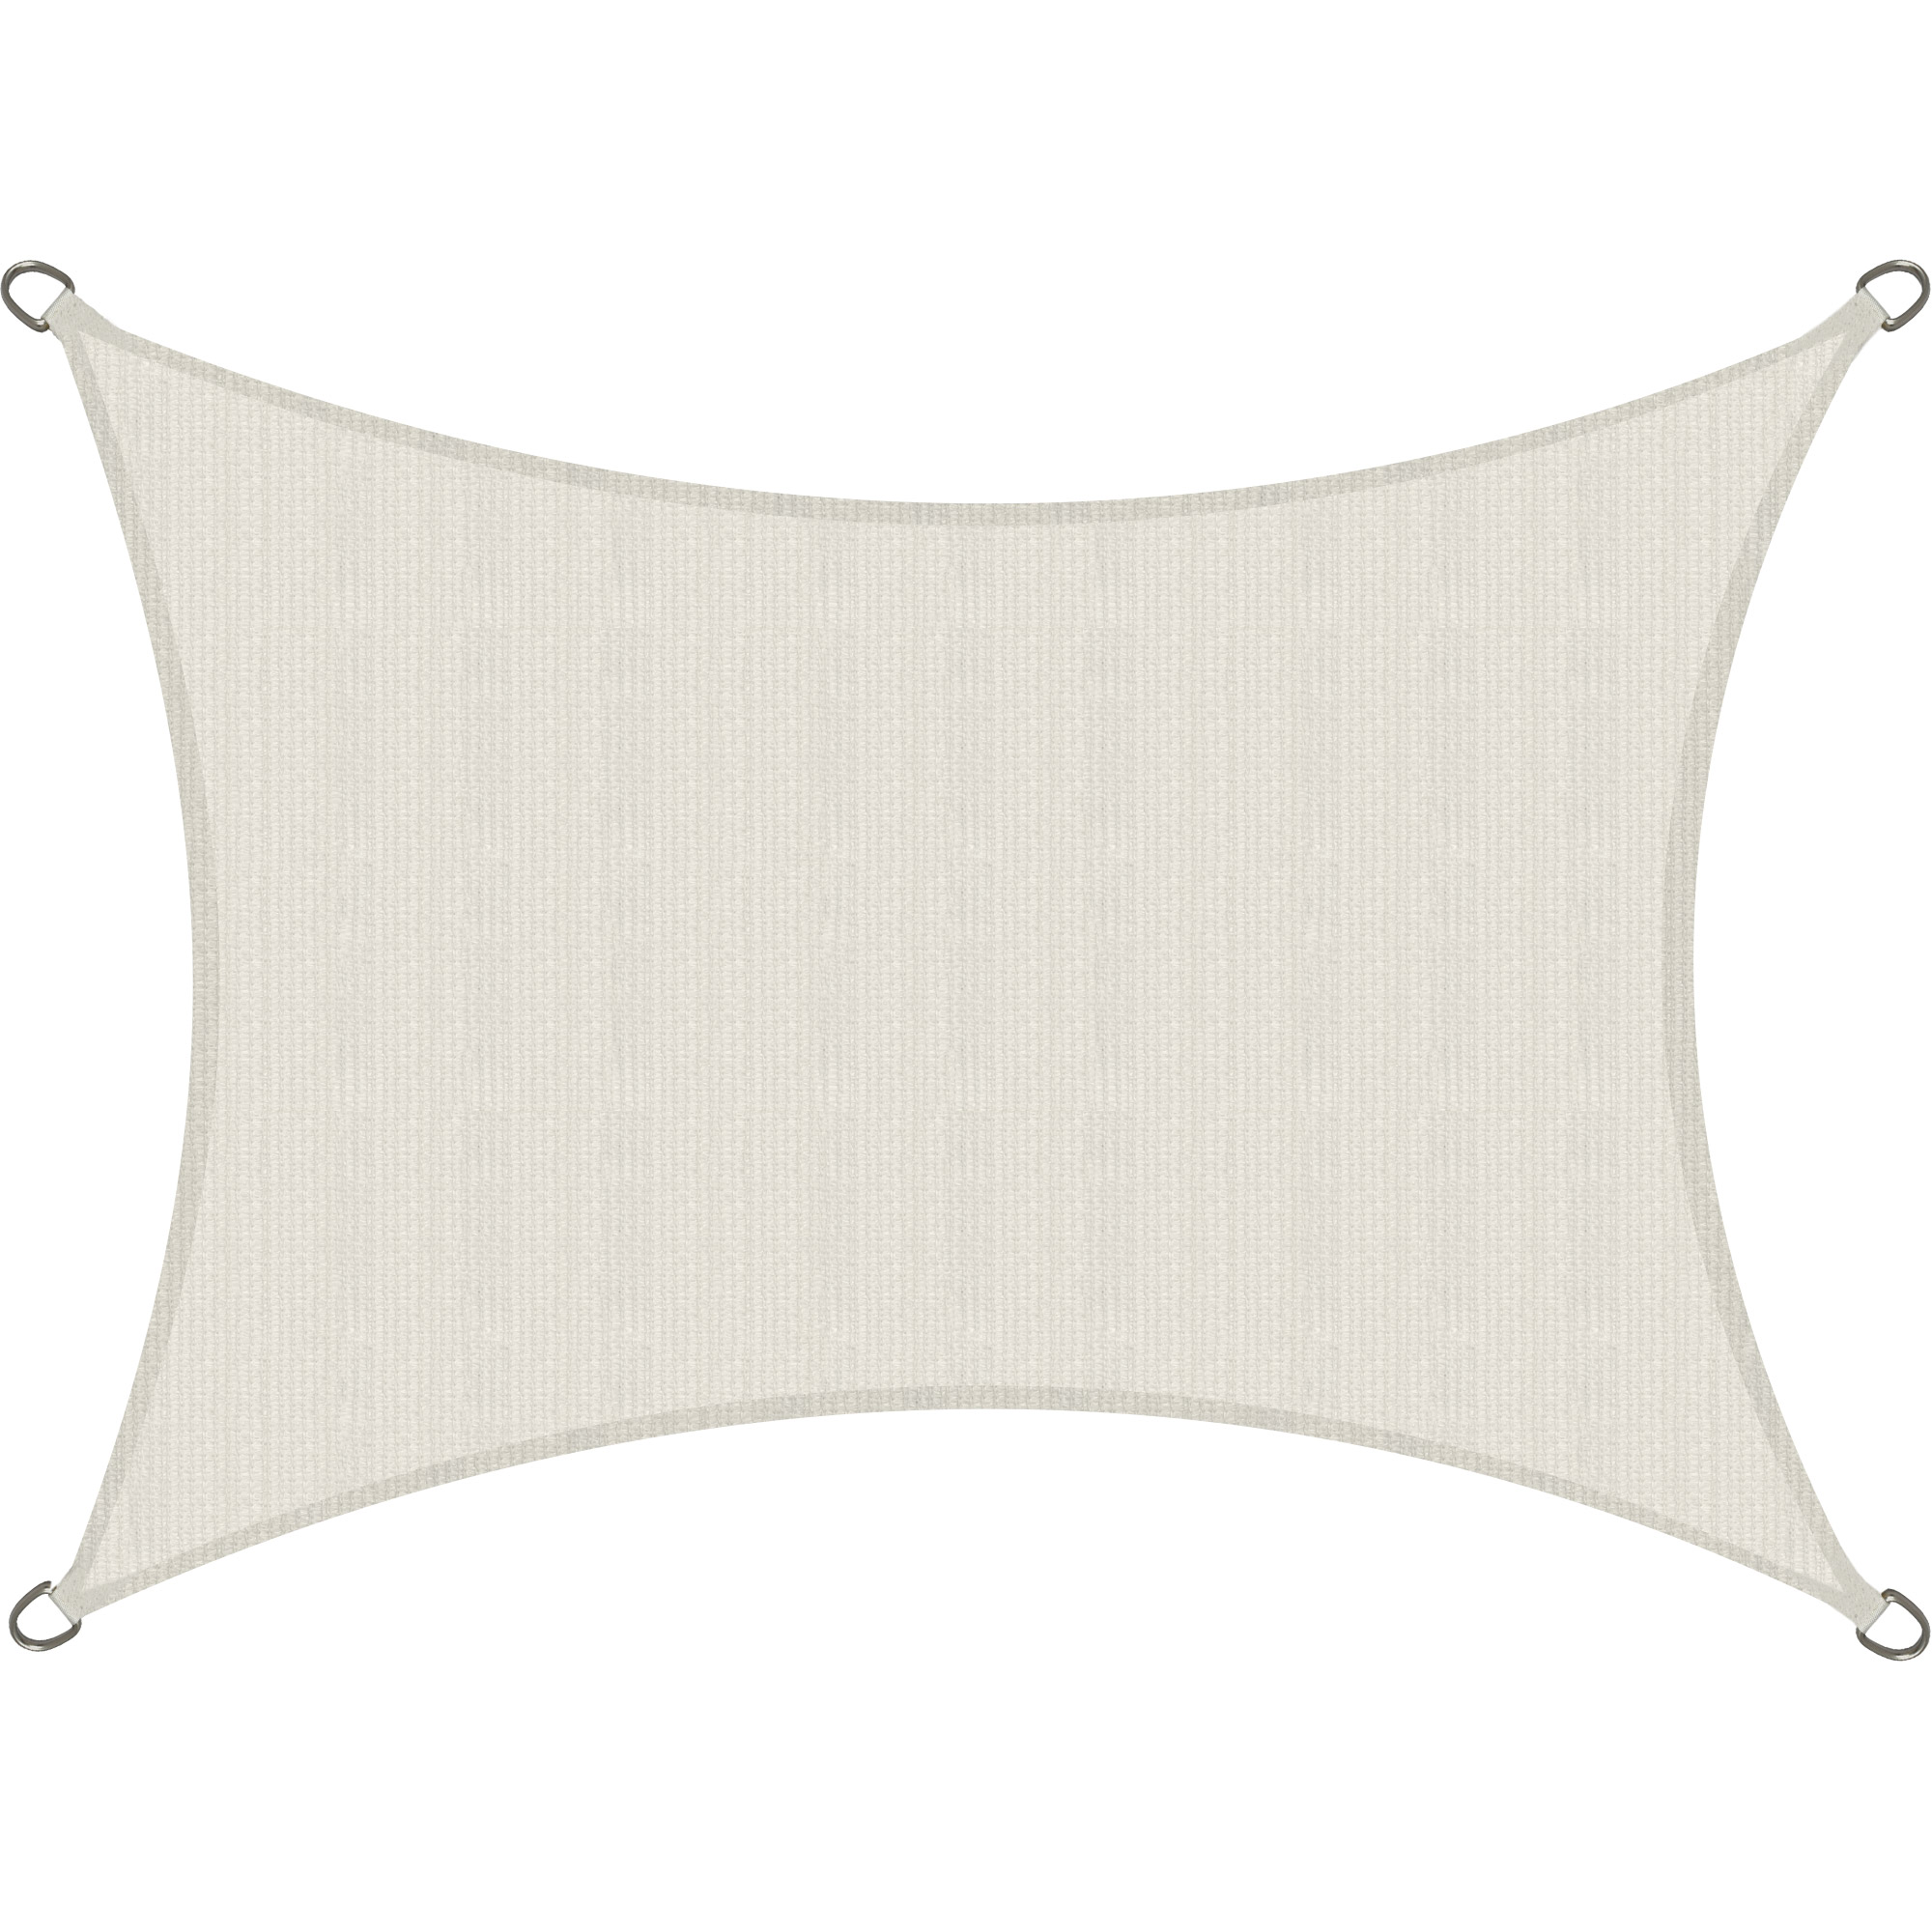 sonnensegel rechteck sonnenschutz rechteckig hdpe uv. Black Bedroom Furniture Sets. Home Design Ideas